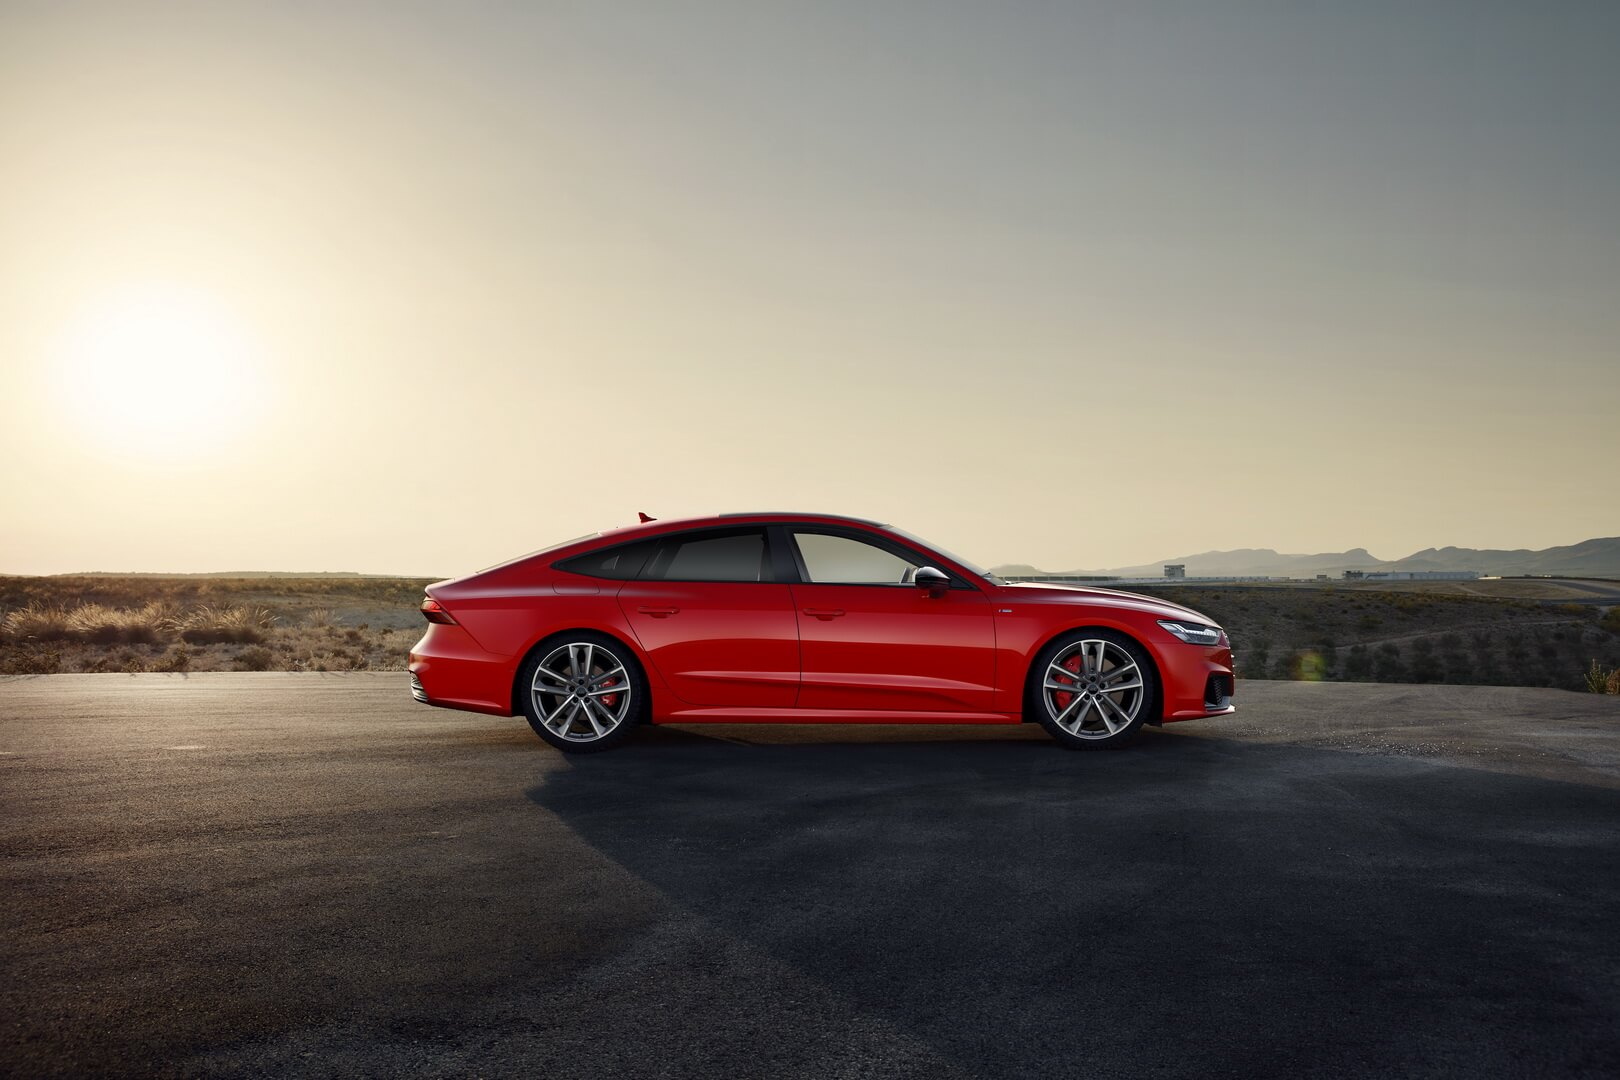 Audi представляет плагин-гибрид A7 Sportback 55 TFSI e quattro